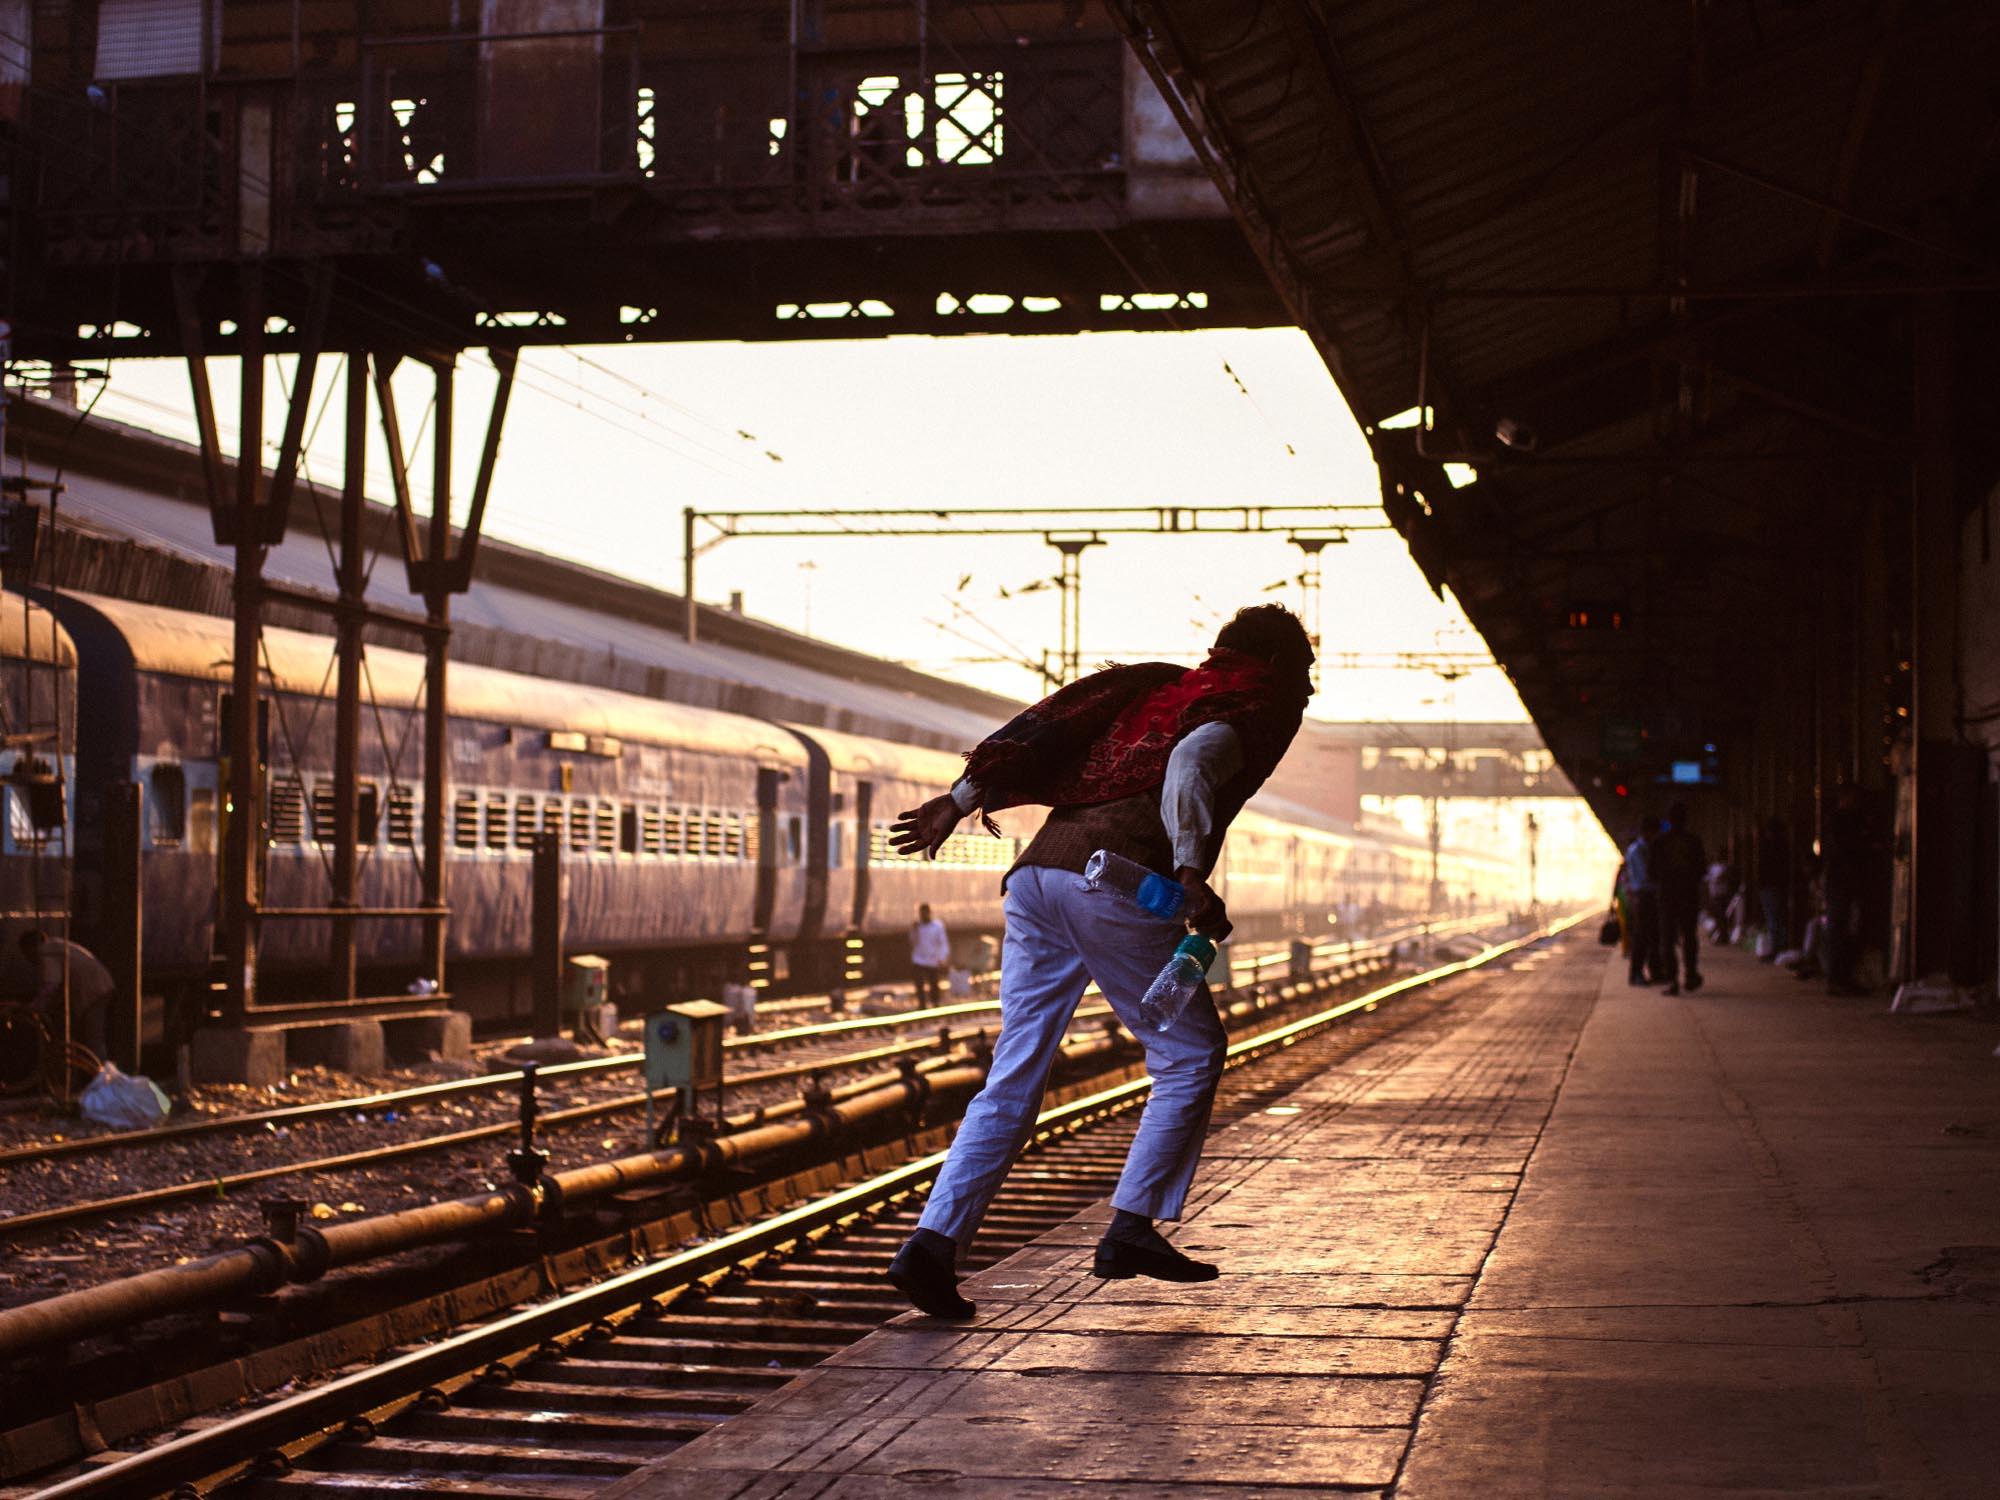 Old Delhi Railway Station, India.  Prints available on Saatchi Art.